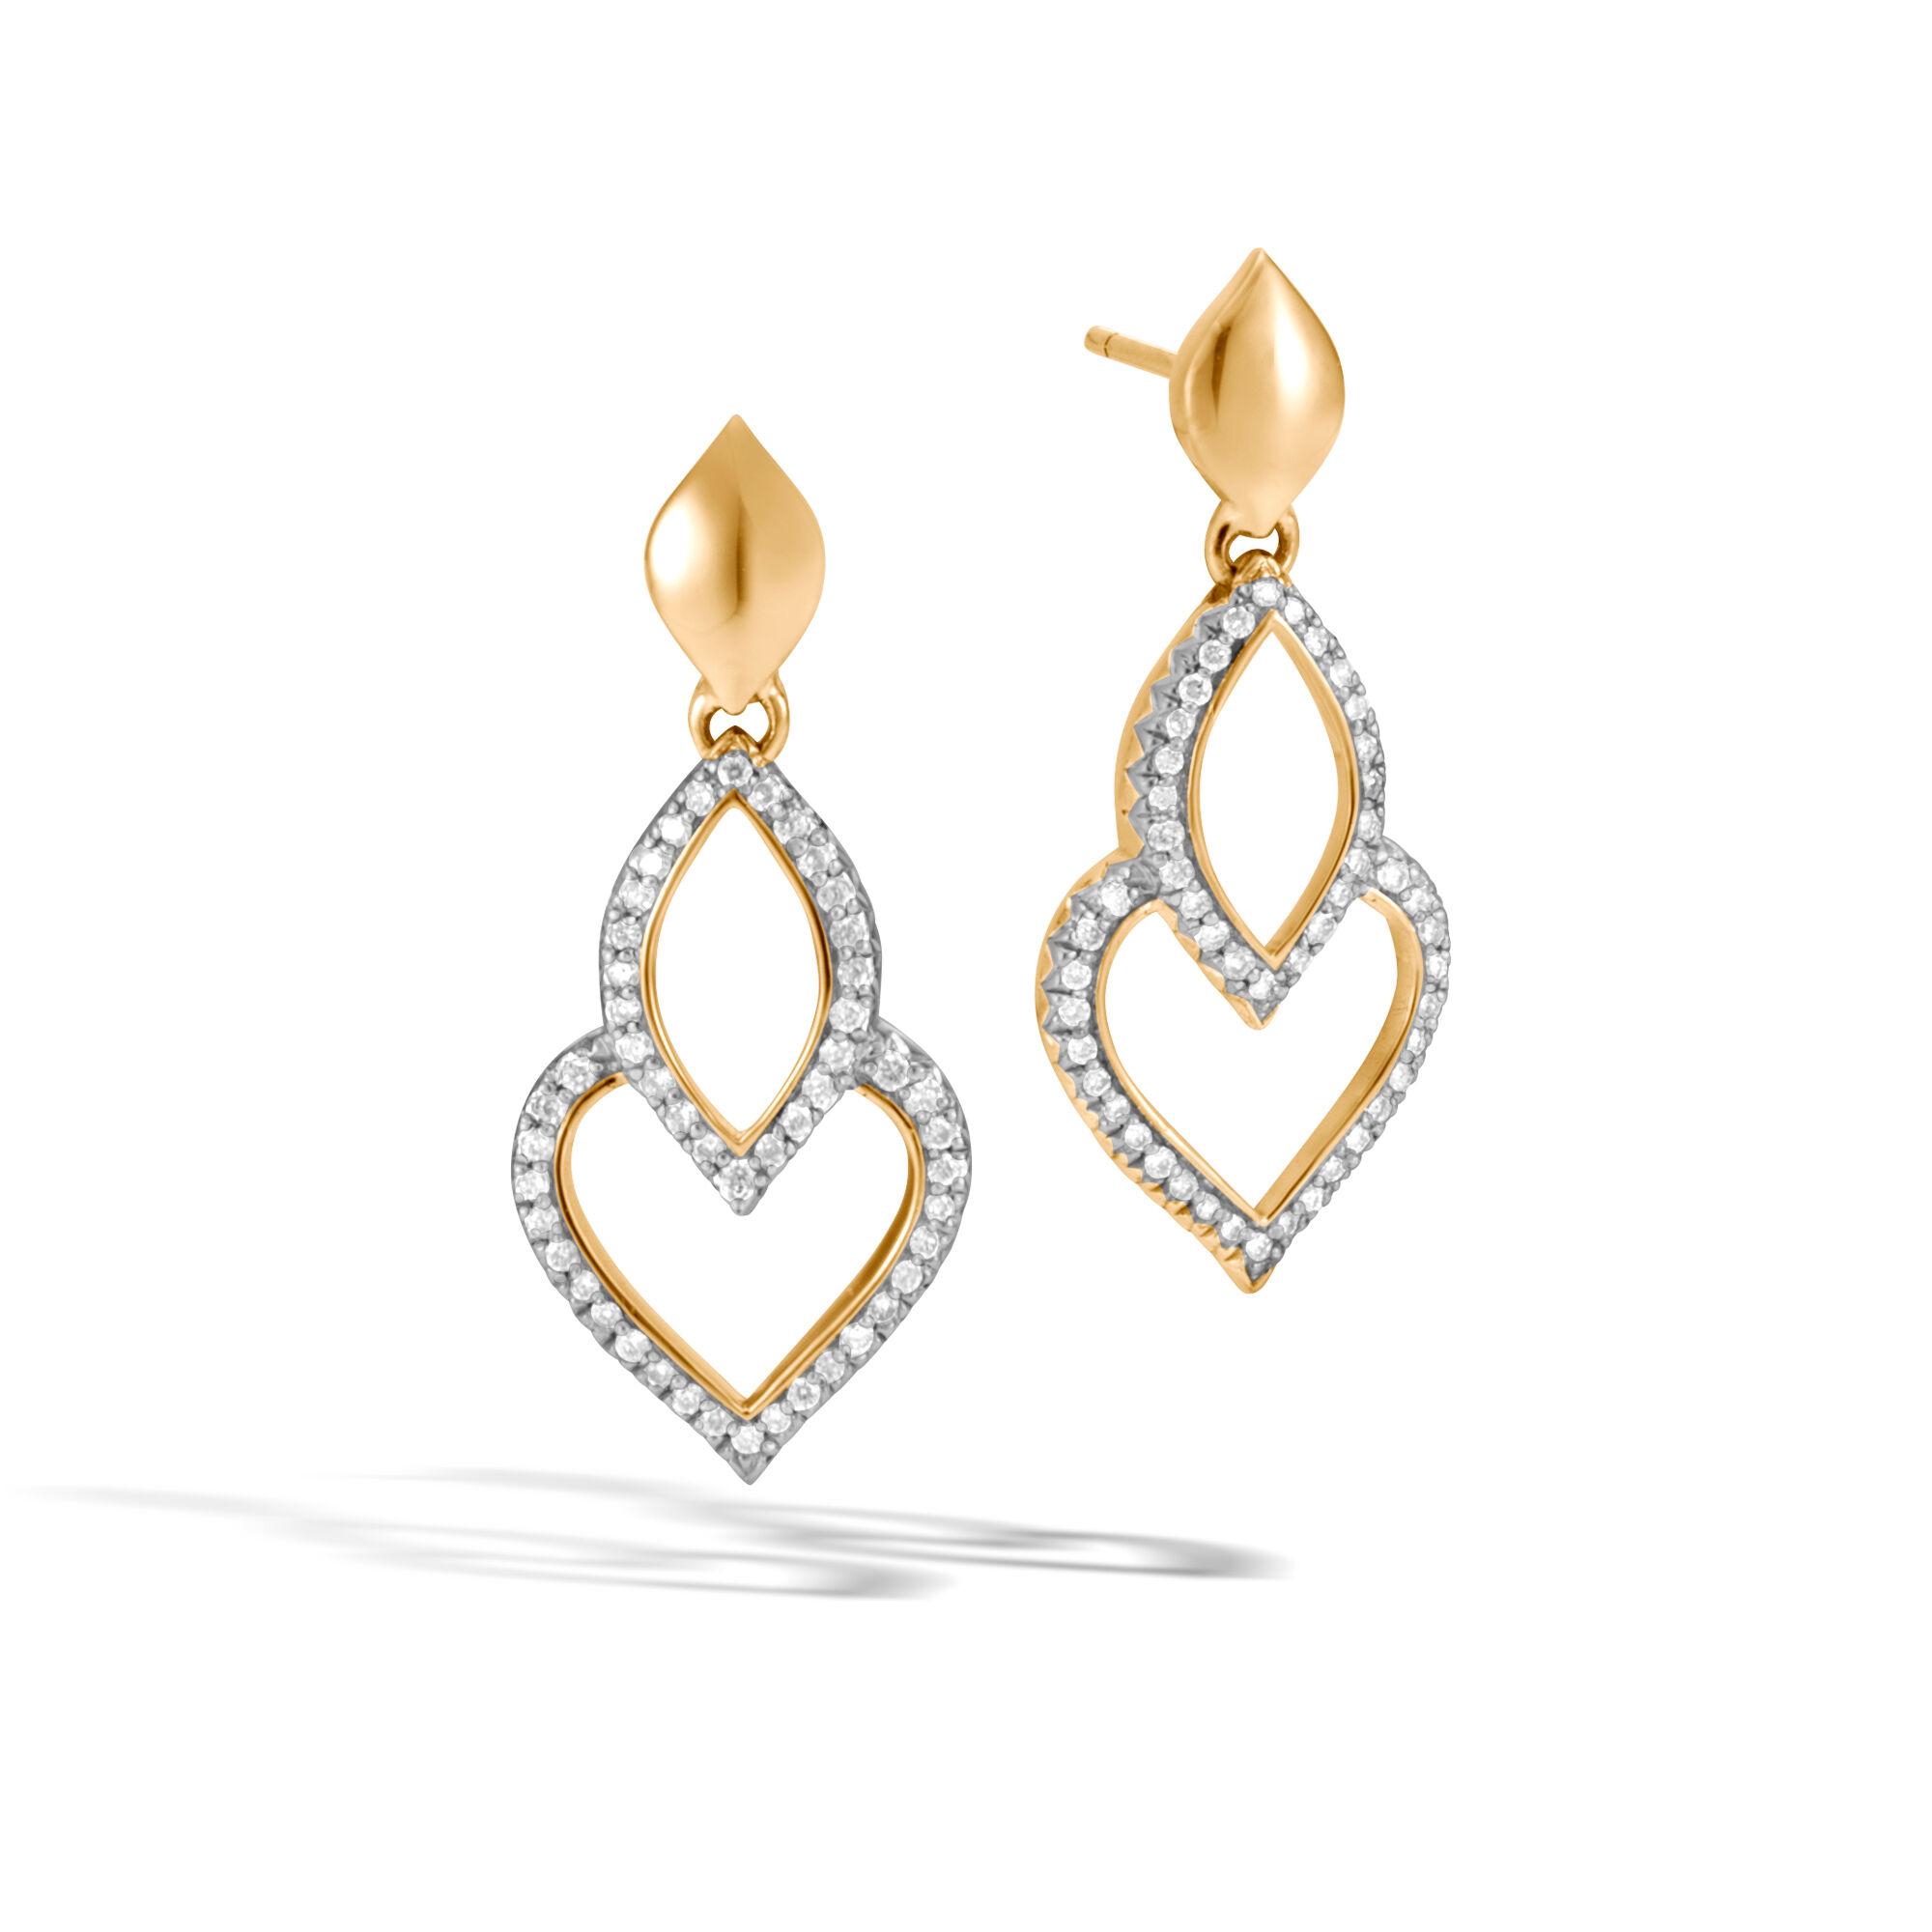 John Hardy Naga Drop Earrings w/ Diamonds 9anPfD60